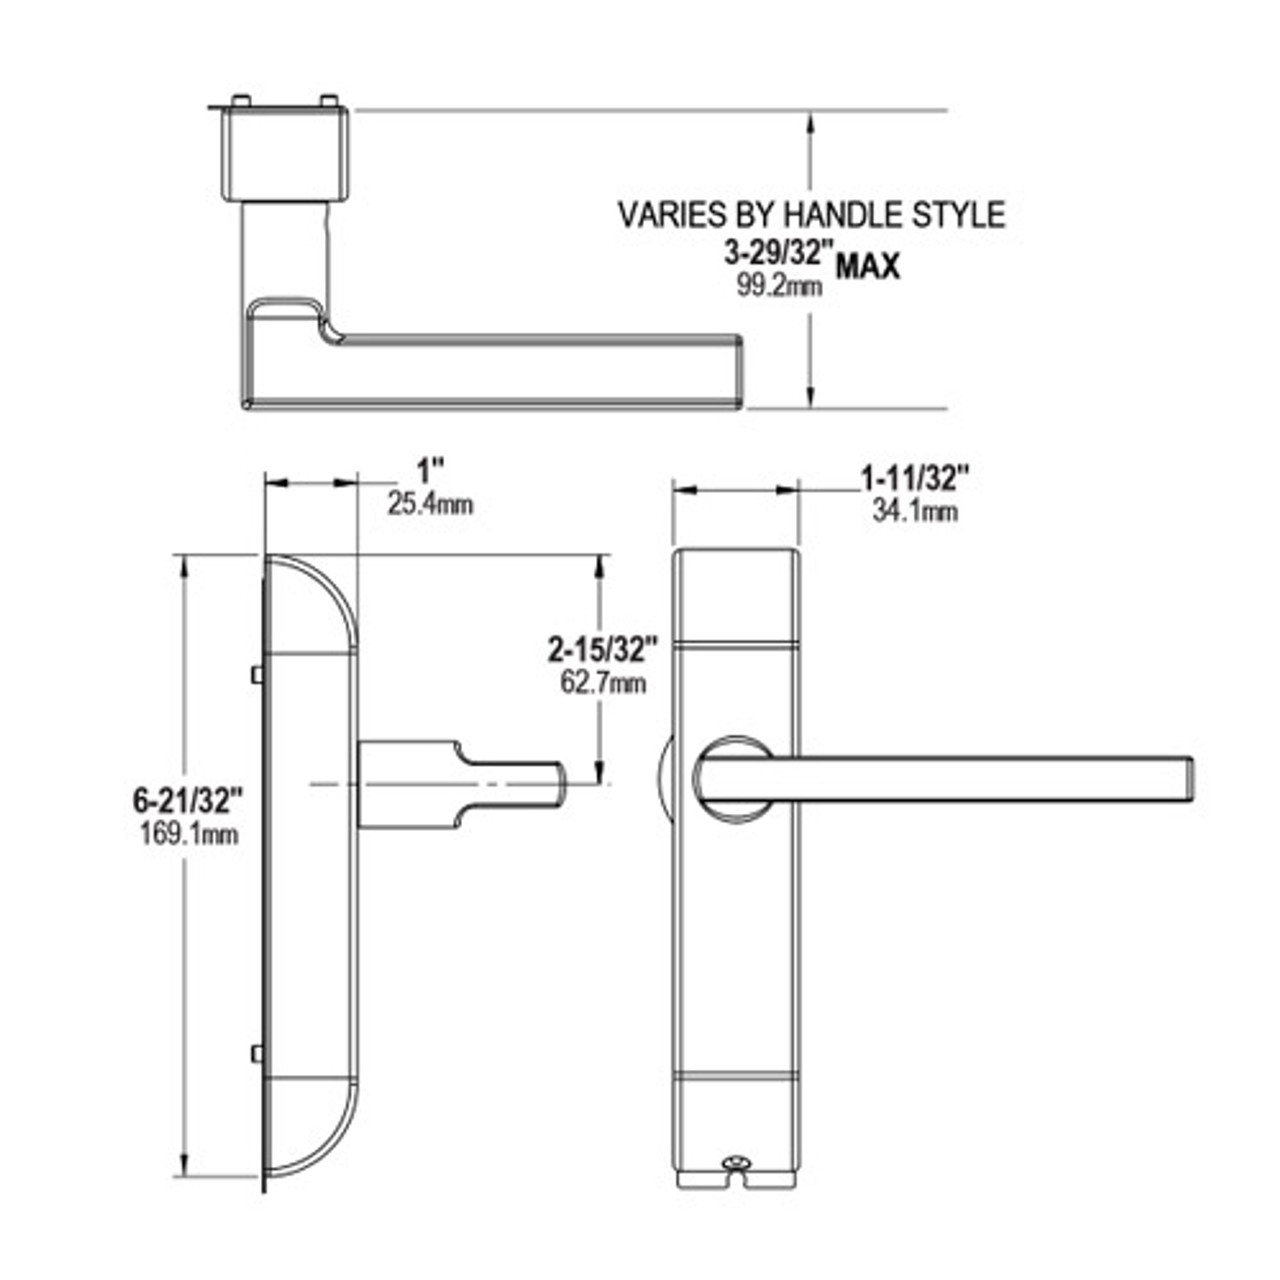 4600-MD-651-US10B Adams Rite MD Designer handle Dimensional View